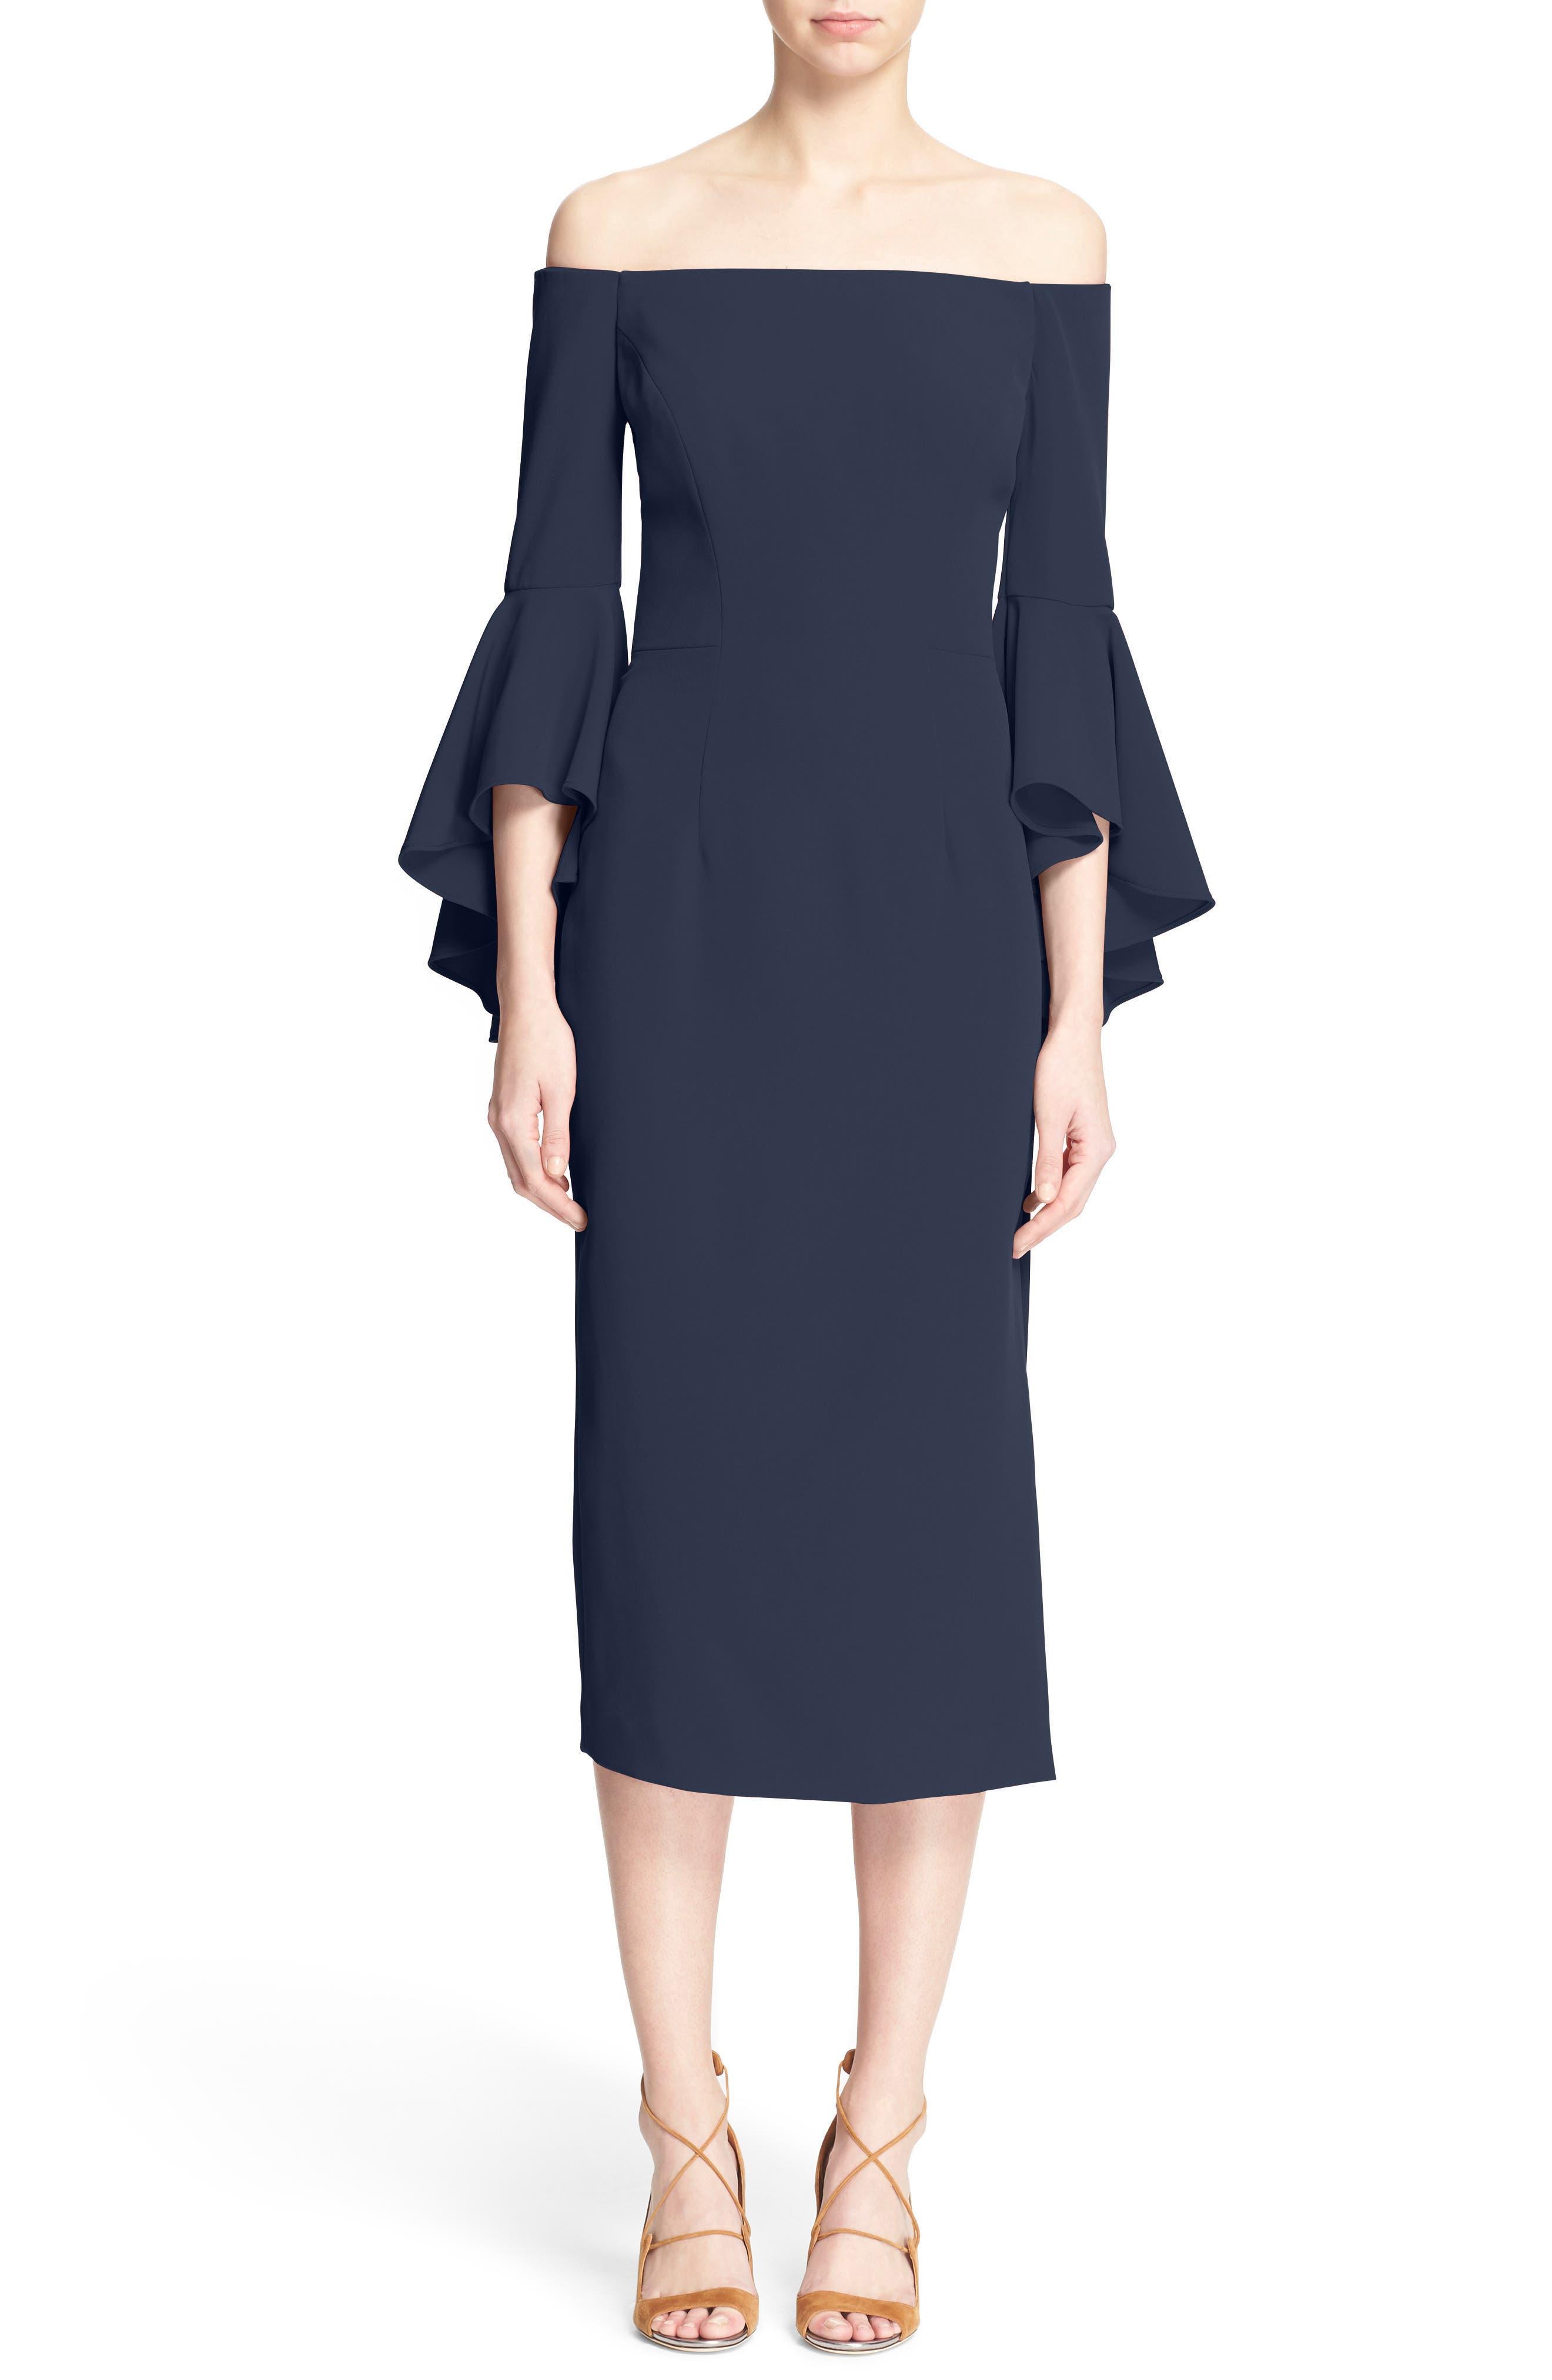 Alternate Image 1 Selected - Milly Selena Off the Shoulder Midi Dress